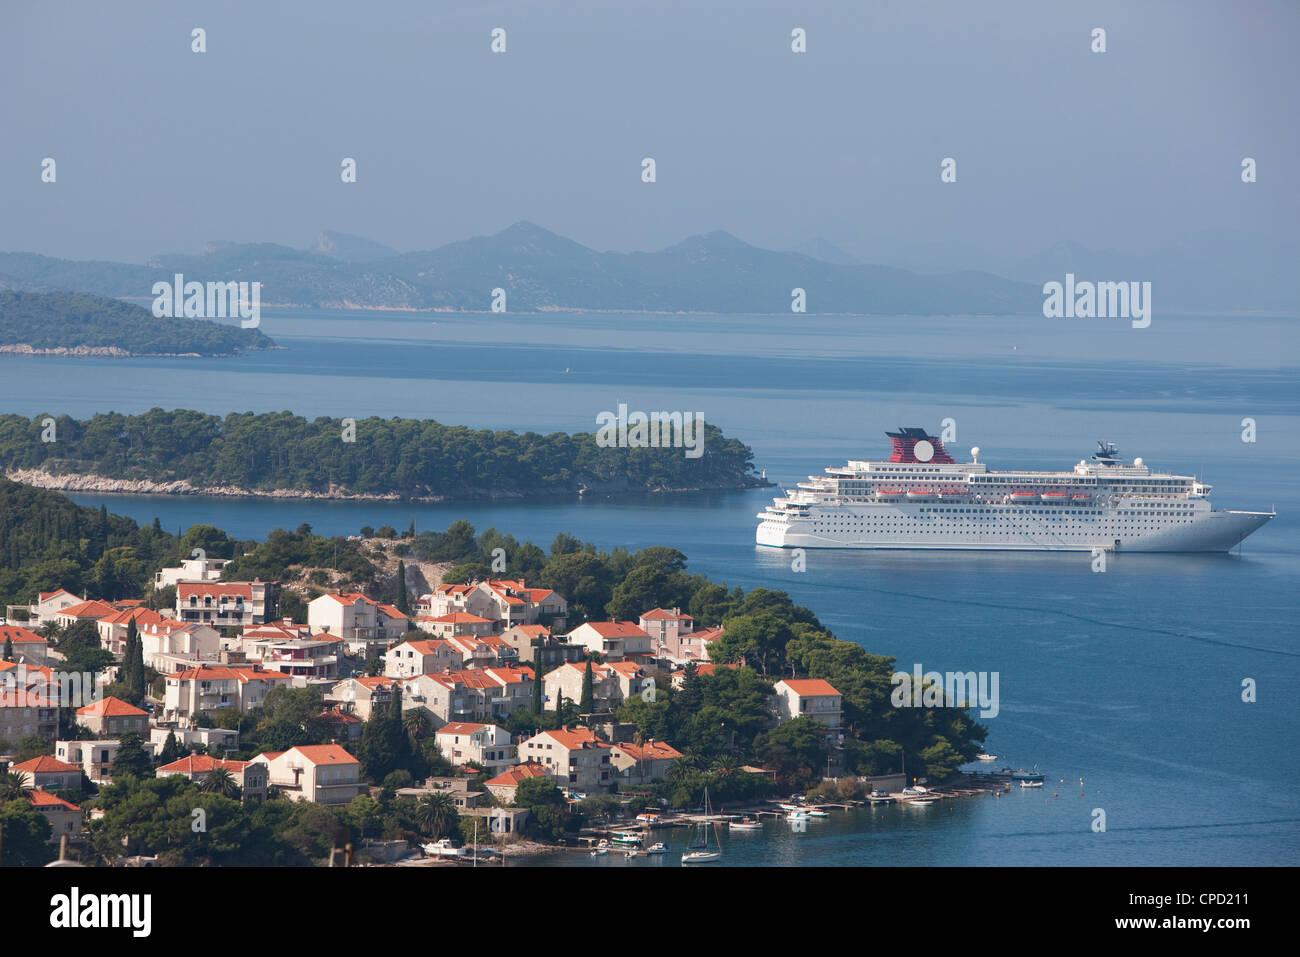 Cruise ships moored in port of Gruz, Dalmatia, Croatia, Europe - Stock Image